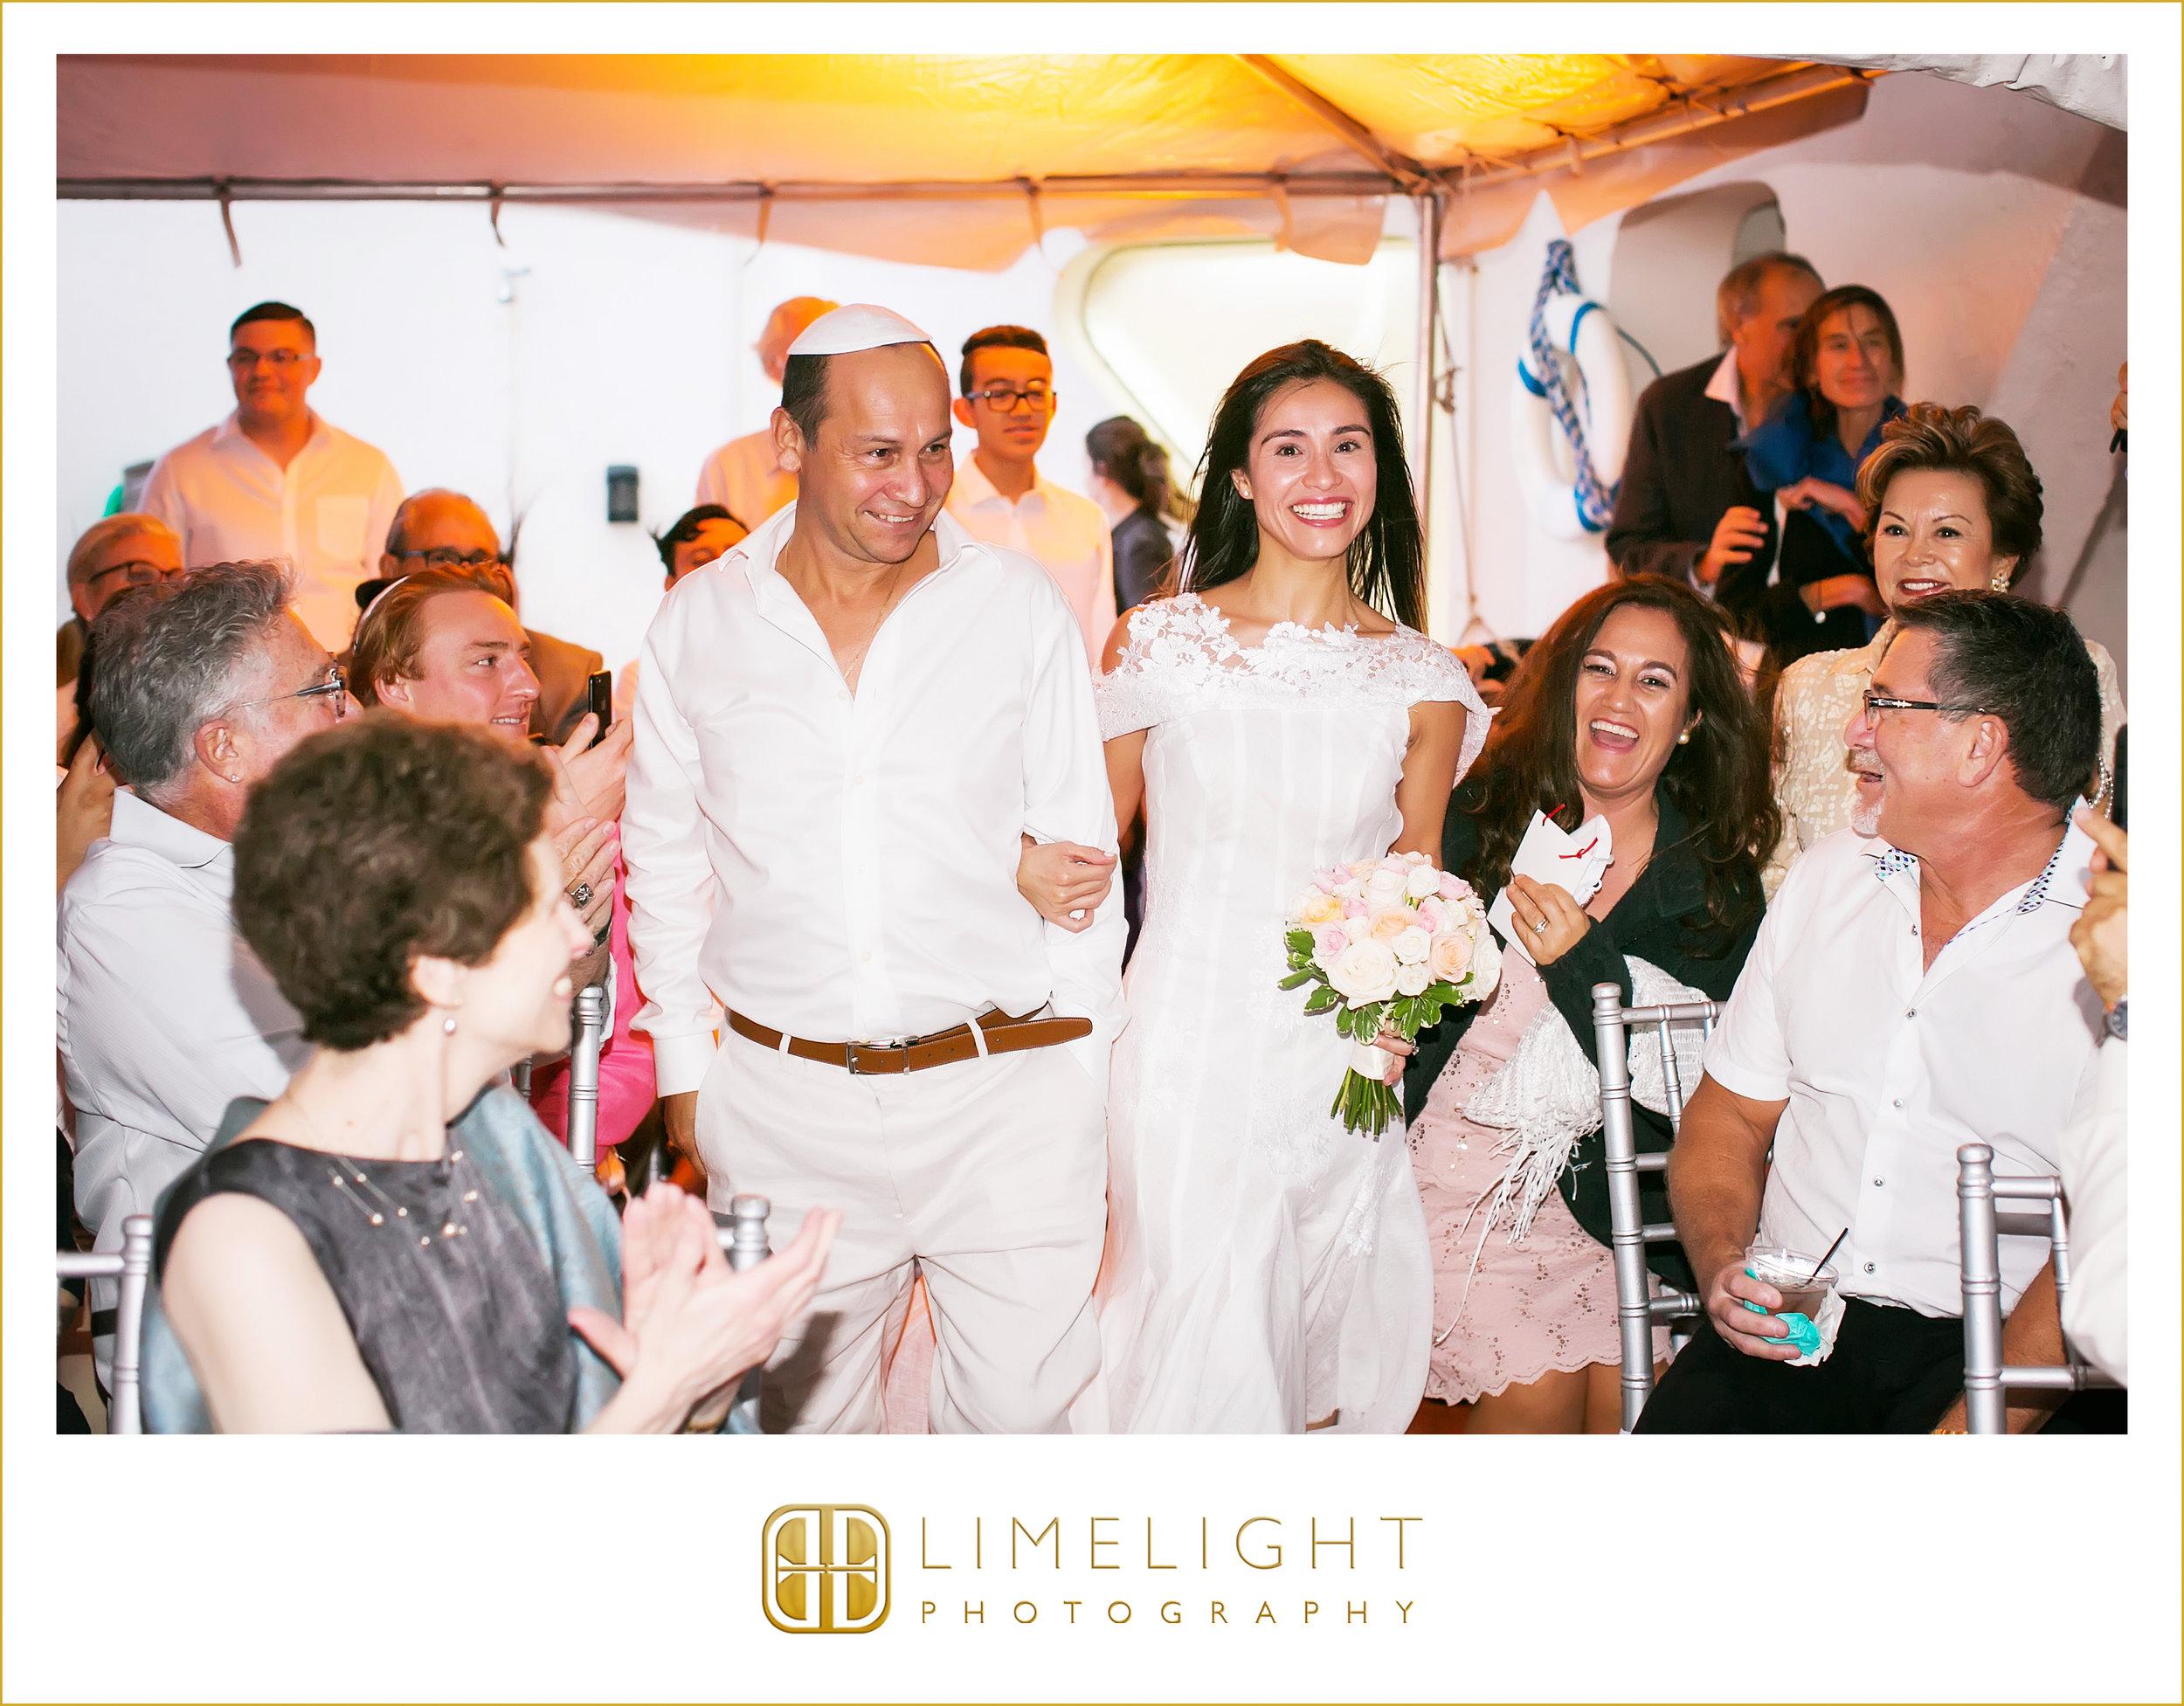 Newlyweds | Married | Wedding